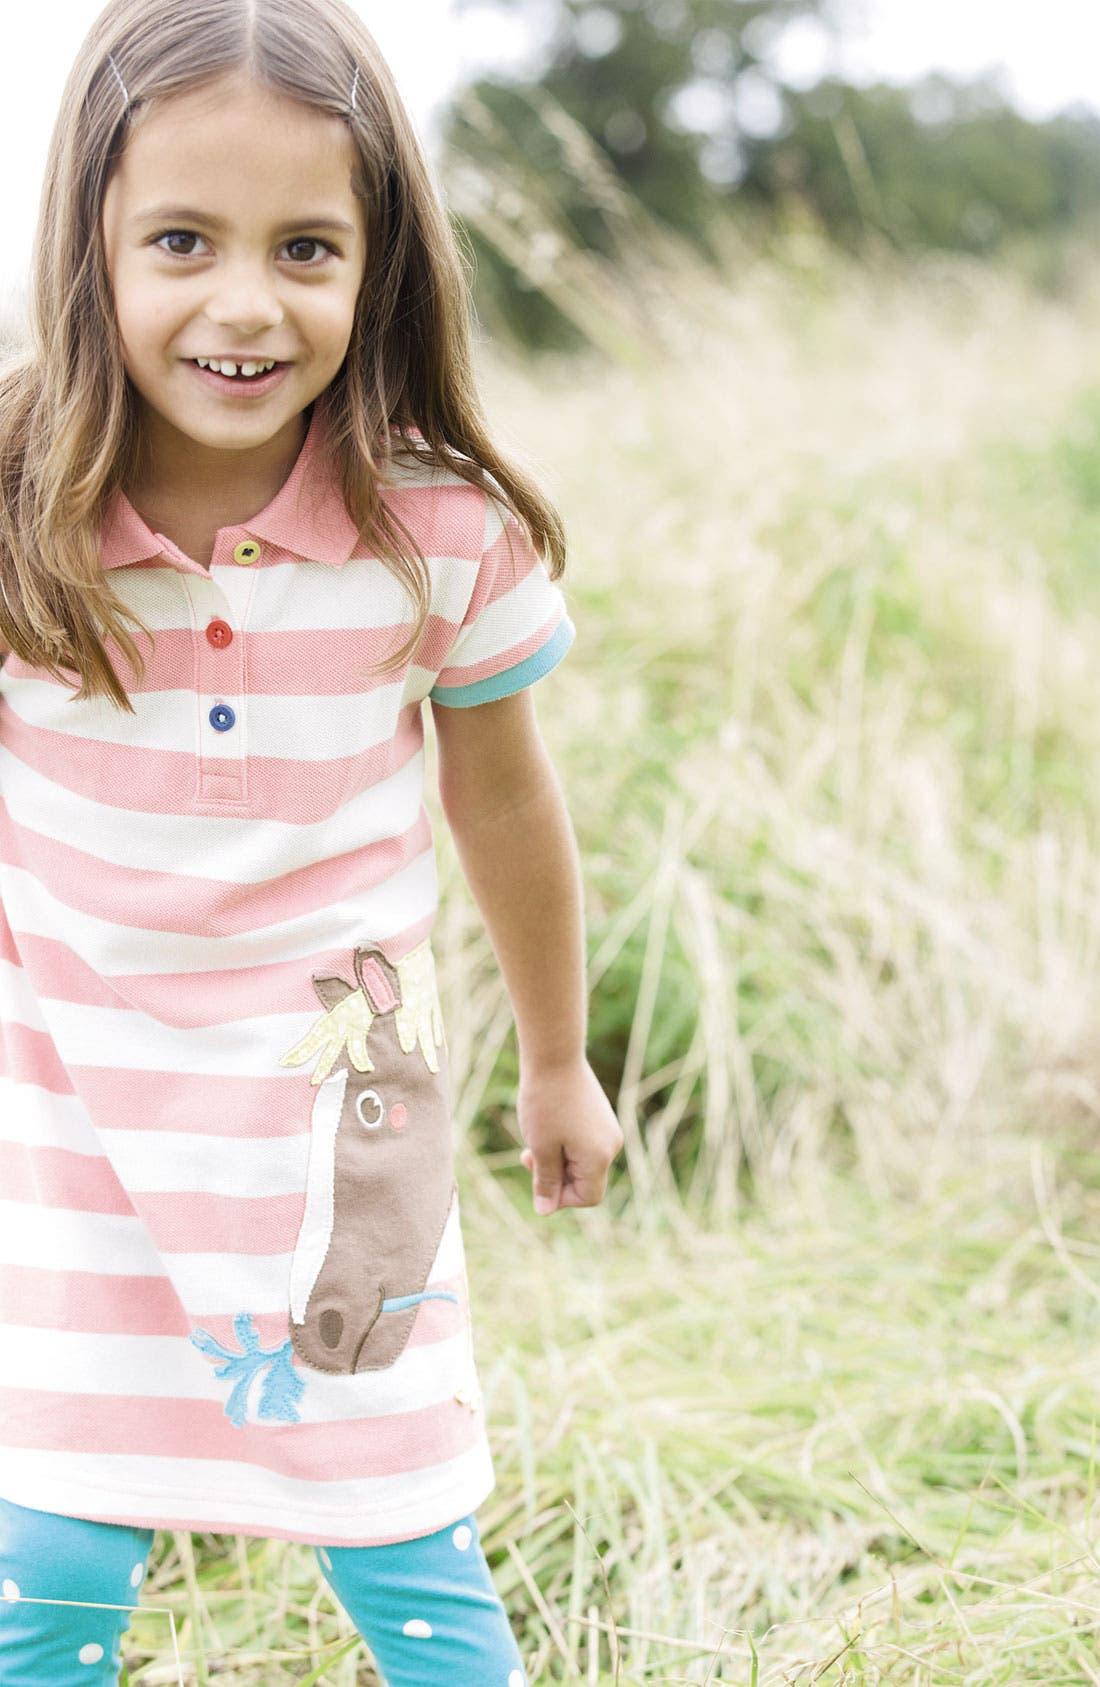 Alternate Image 2  - Mini Boden 'Fun' Appliqué Polo Dress (Toddler, Little Girls & Big Girls)